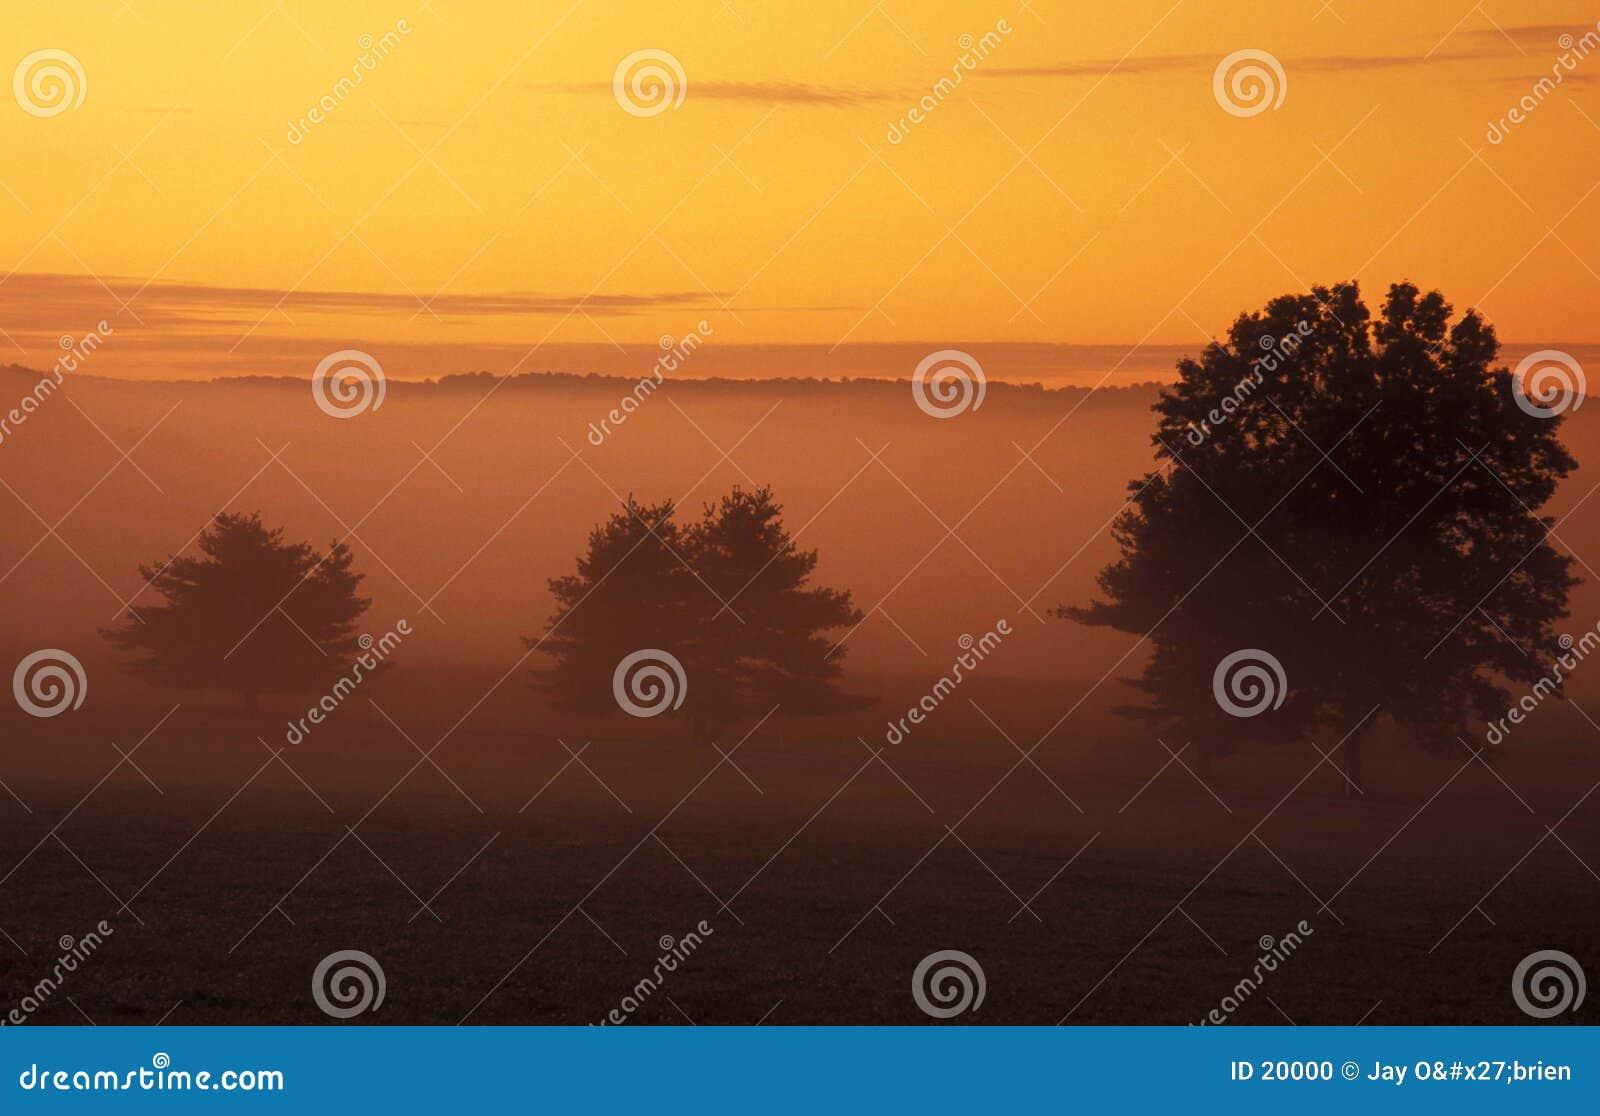 Trees and sunrise